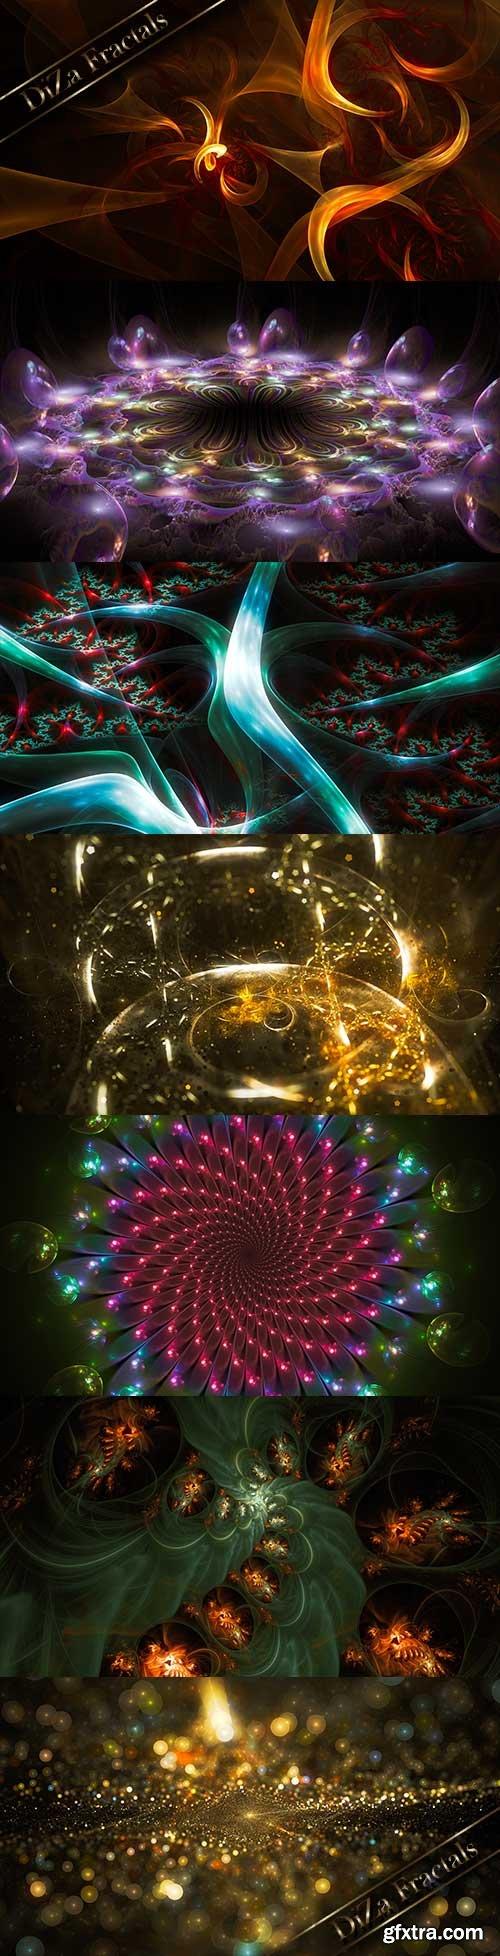 Extraterrestrial world of fractals - 3